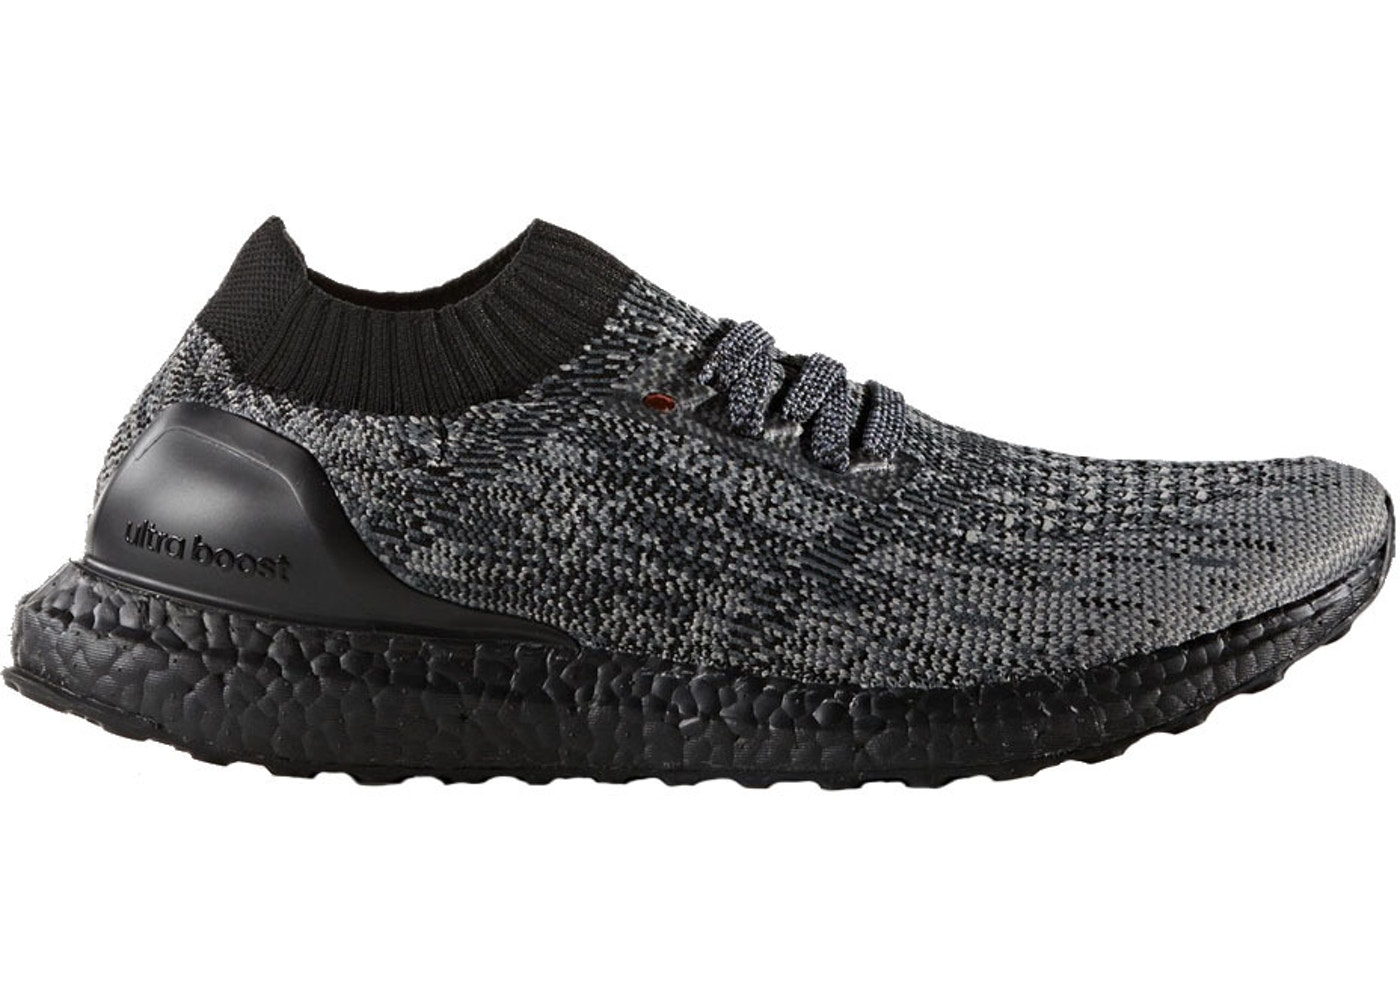 49023c78c adidas Ultra Boost Uncaged Triple Black - BB4679